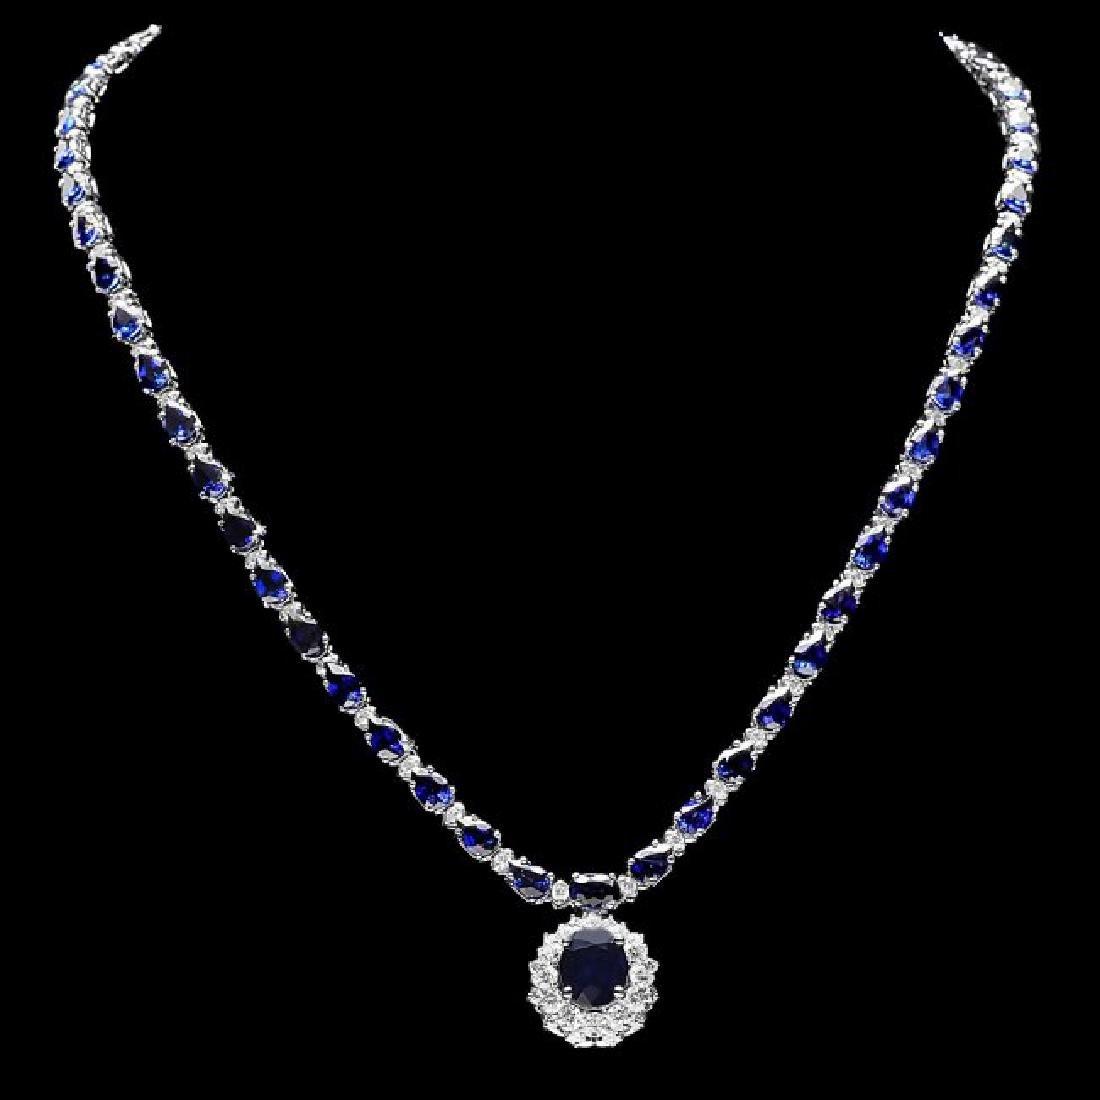 14k Gold 27ct Sapphire 3.35ct Diamond Necklace